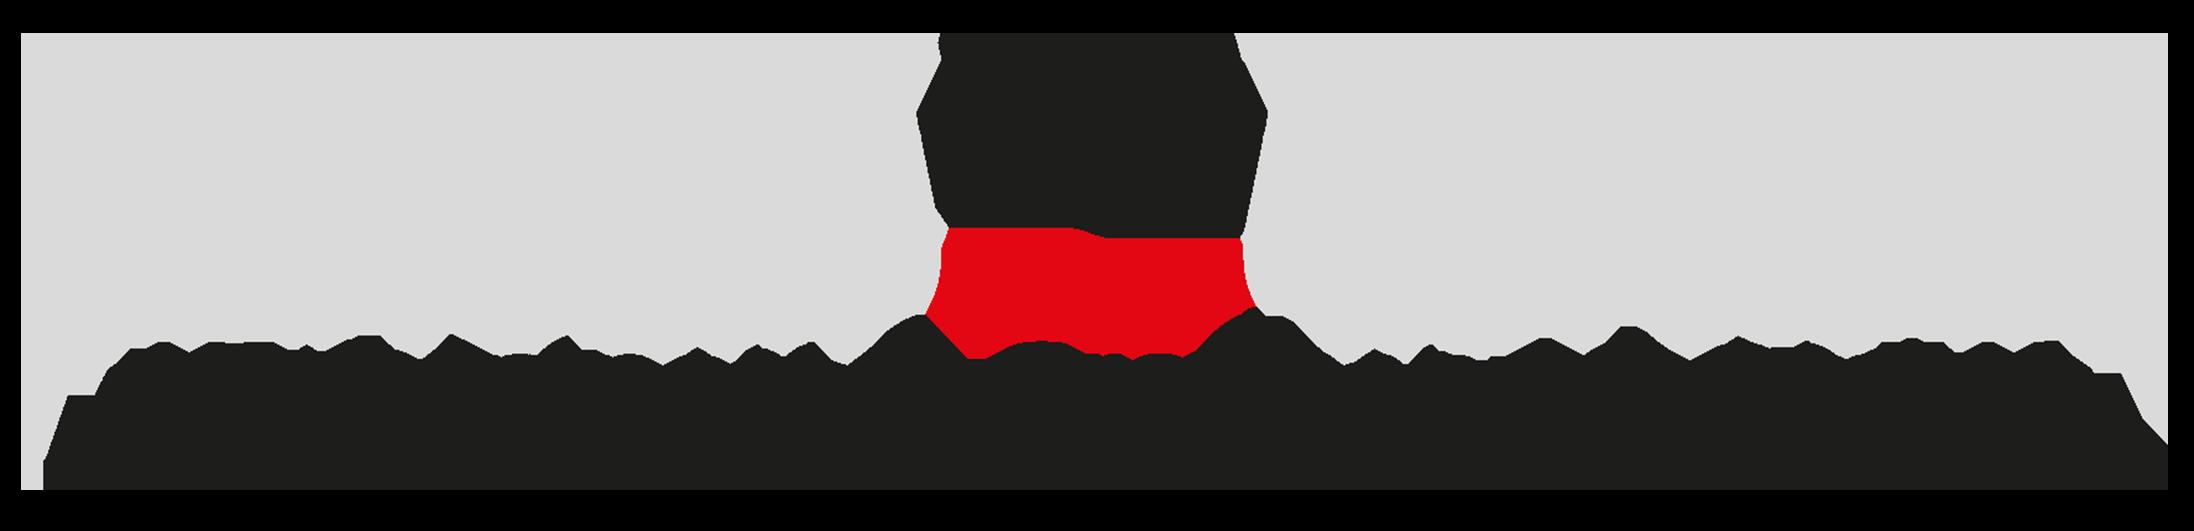 Reinders Weinimport & Großhandel GmbH